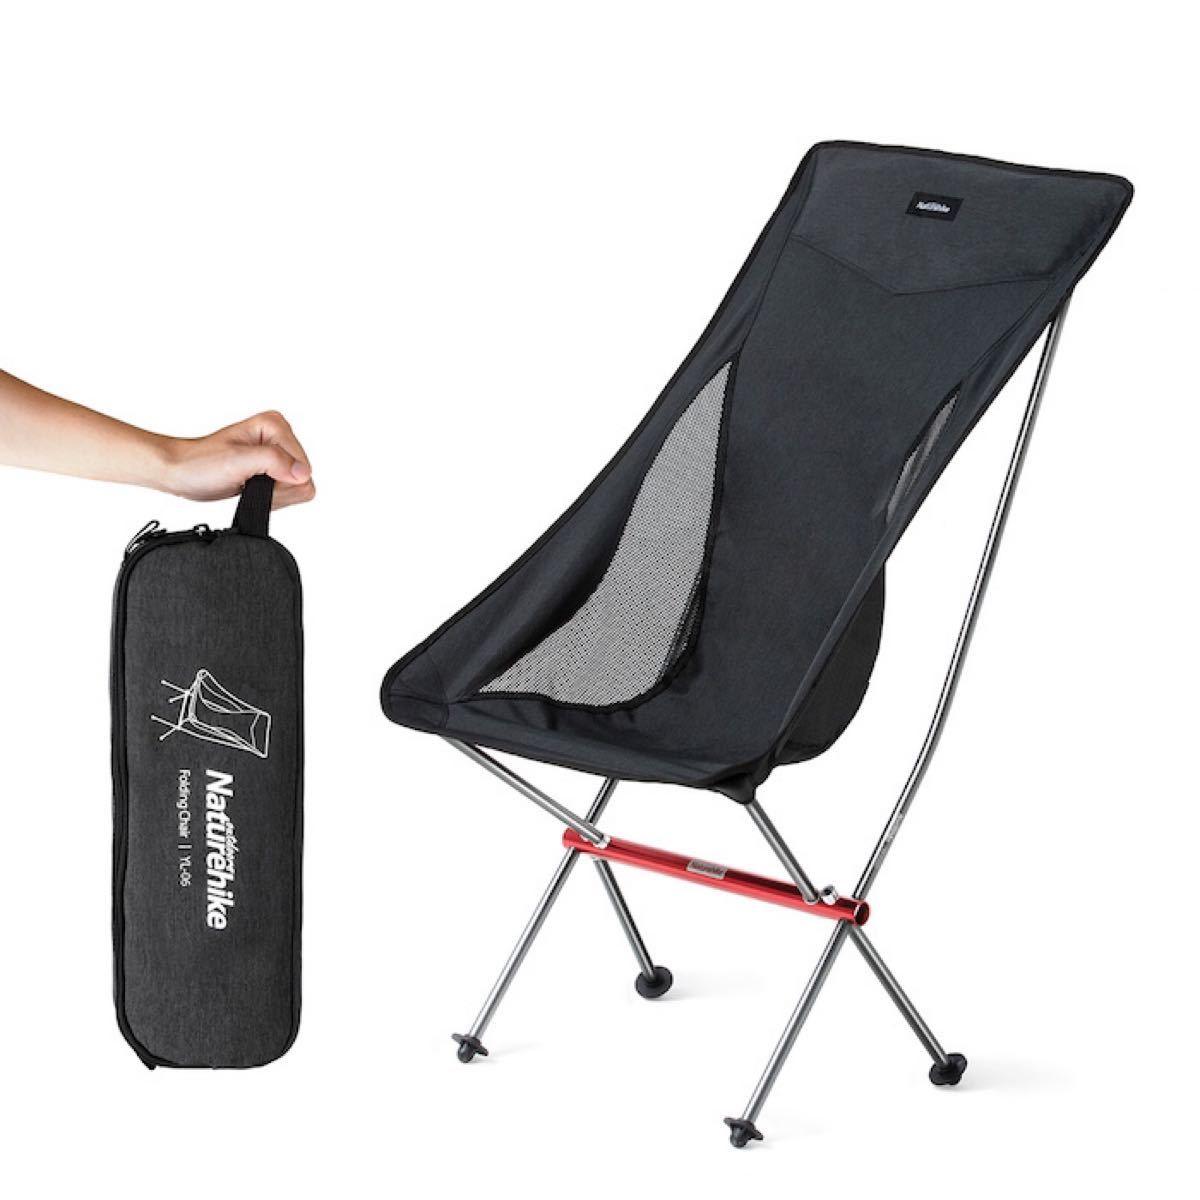 Naturehike ネイチャーハイク フォールディング アウトドアチェア 【耐荷重150kg】 椅子 軽量